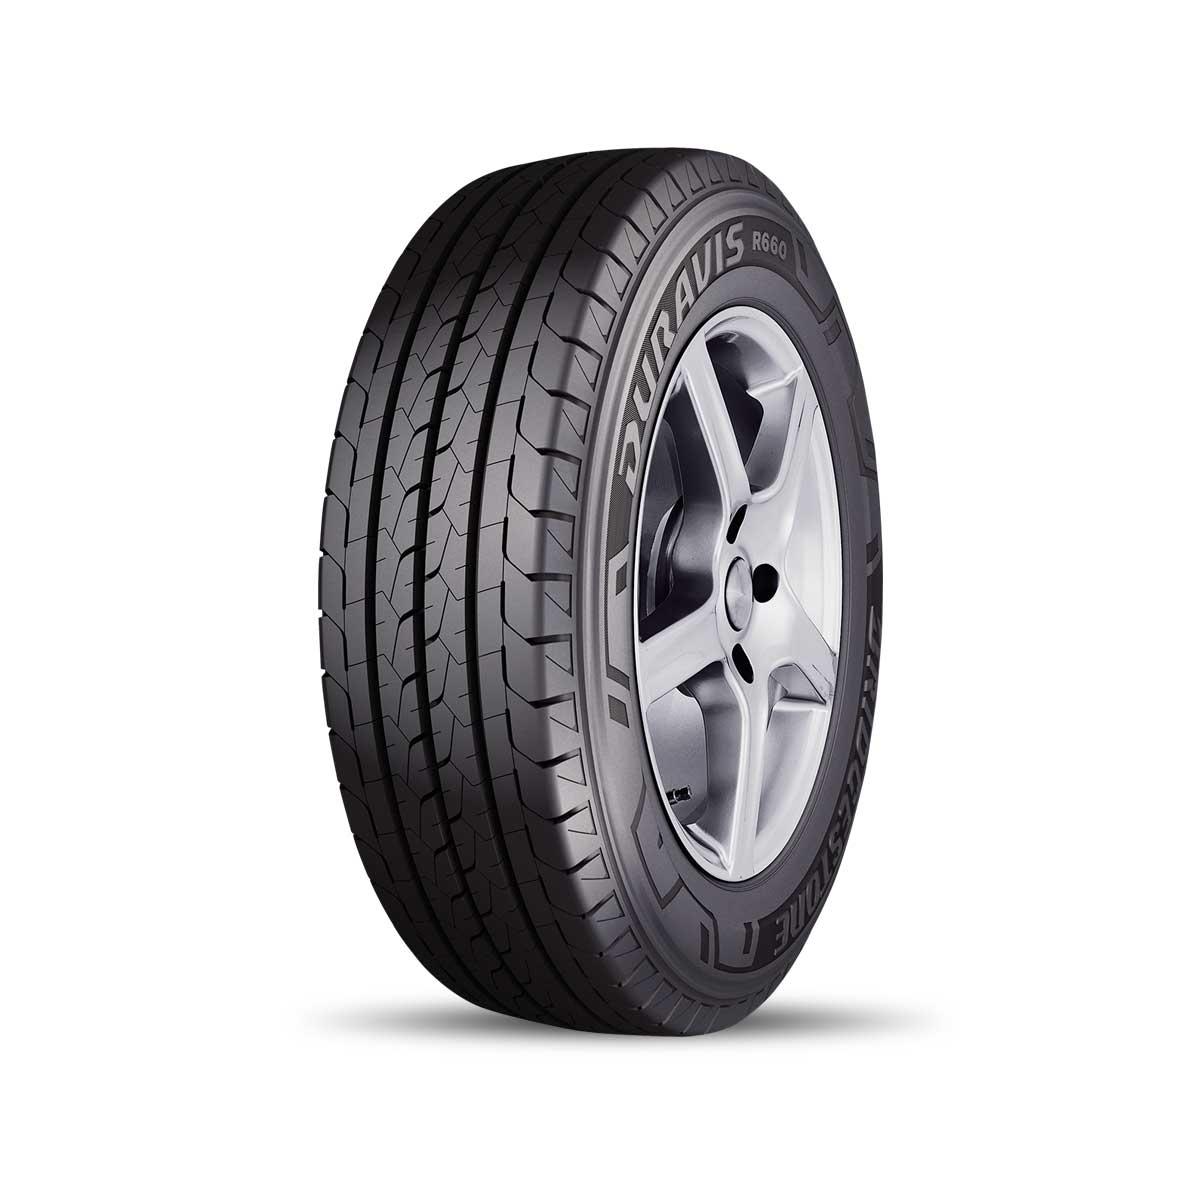 Bridgestone, DURAVIS R660 Sommer 112708